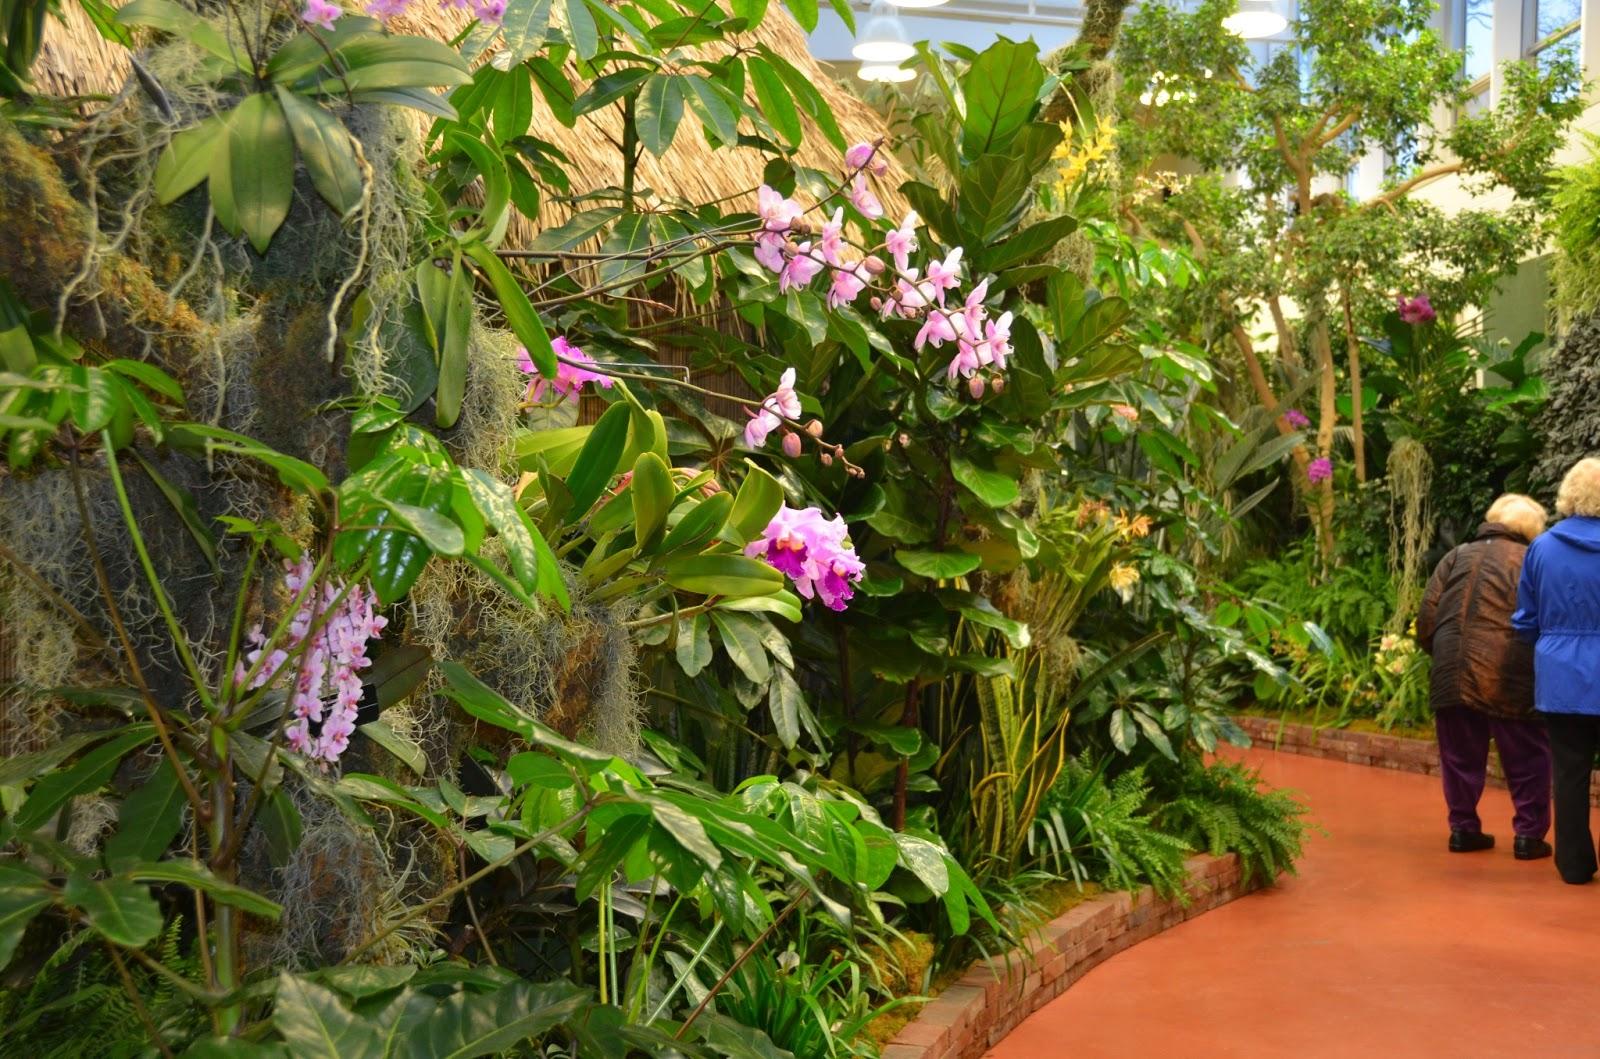 Orchids on display at missouri botanical garden flour - Orchid show missouri botanical garden ...